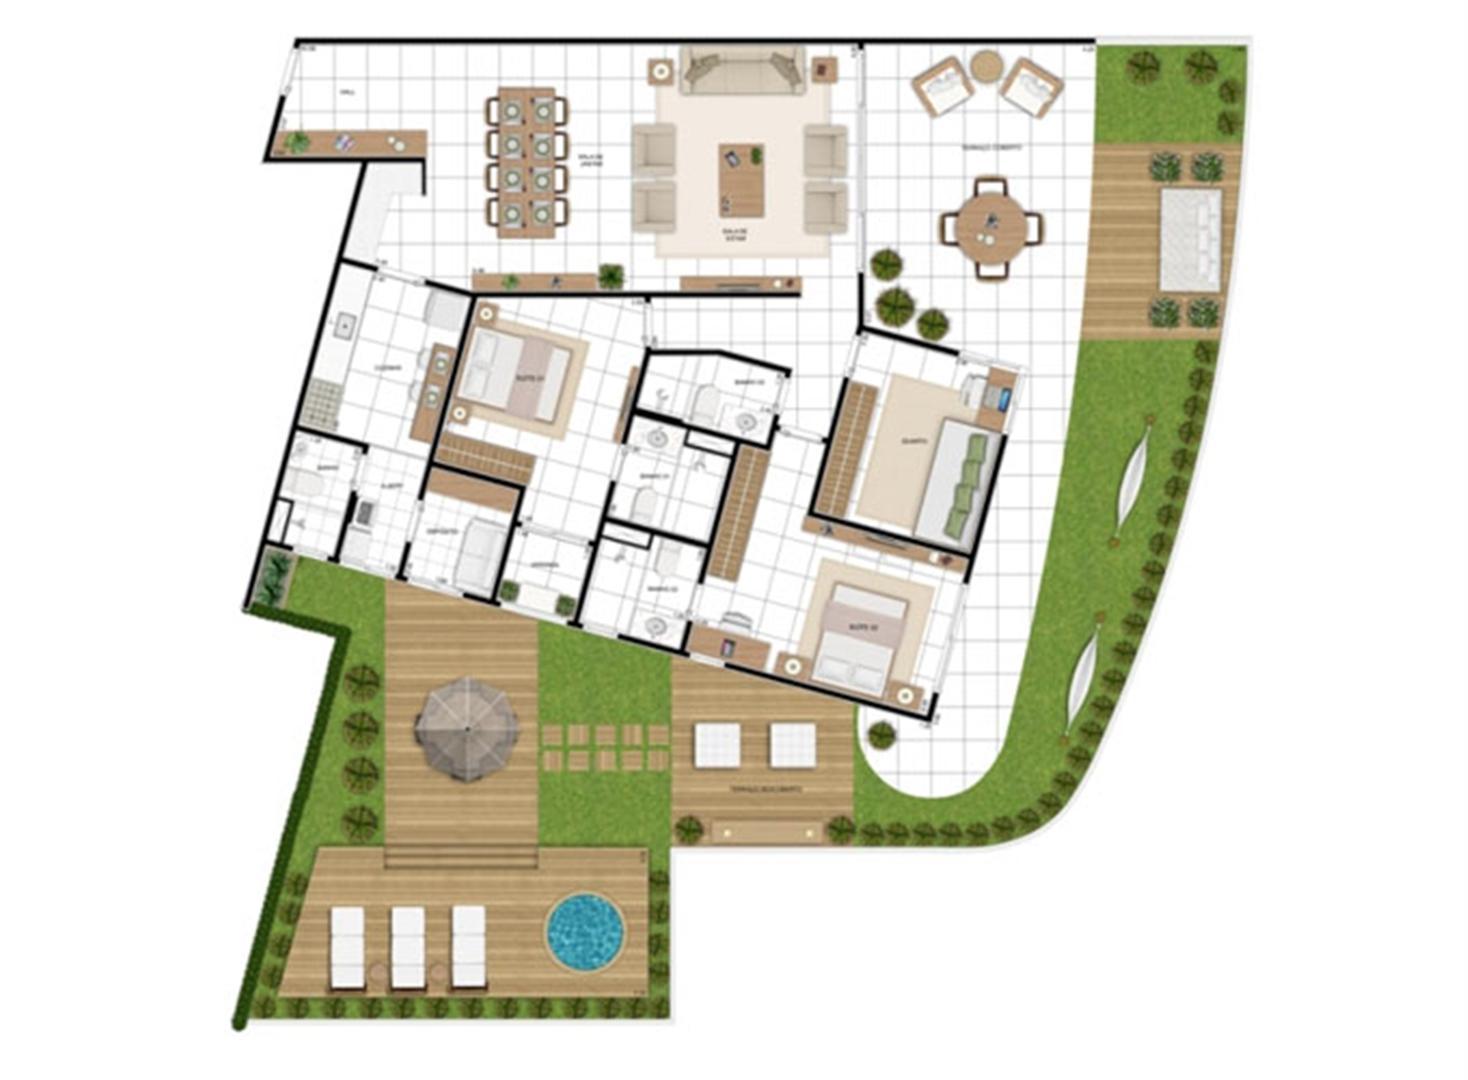 PLANTA - APTO TIPO E - MAISON 258 m²  | In Mare Bali – Apartamento no  Distrito Litoral de Cotovelo - Parnamirim - Rio Grande do Norte